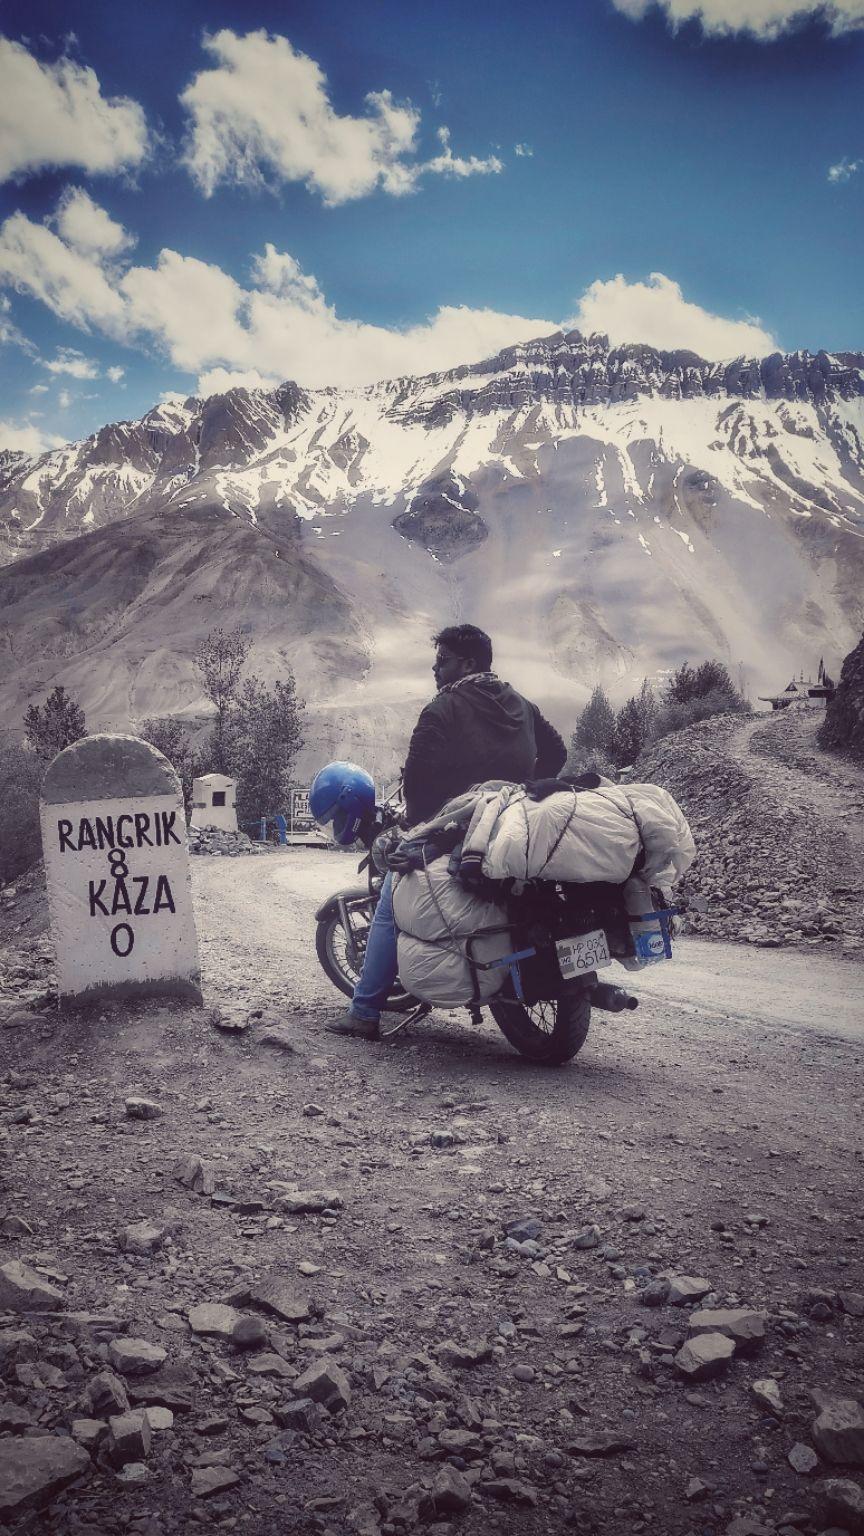 Photo of Kaza By Arunabh Vishwakarma